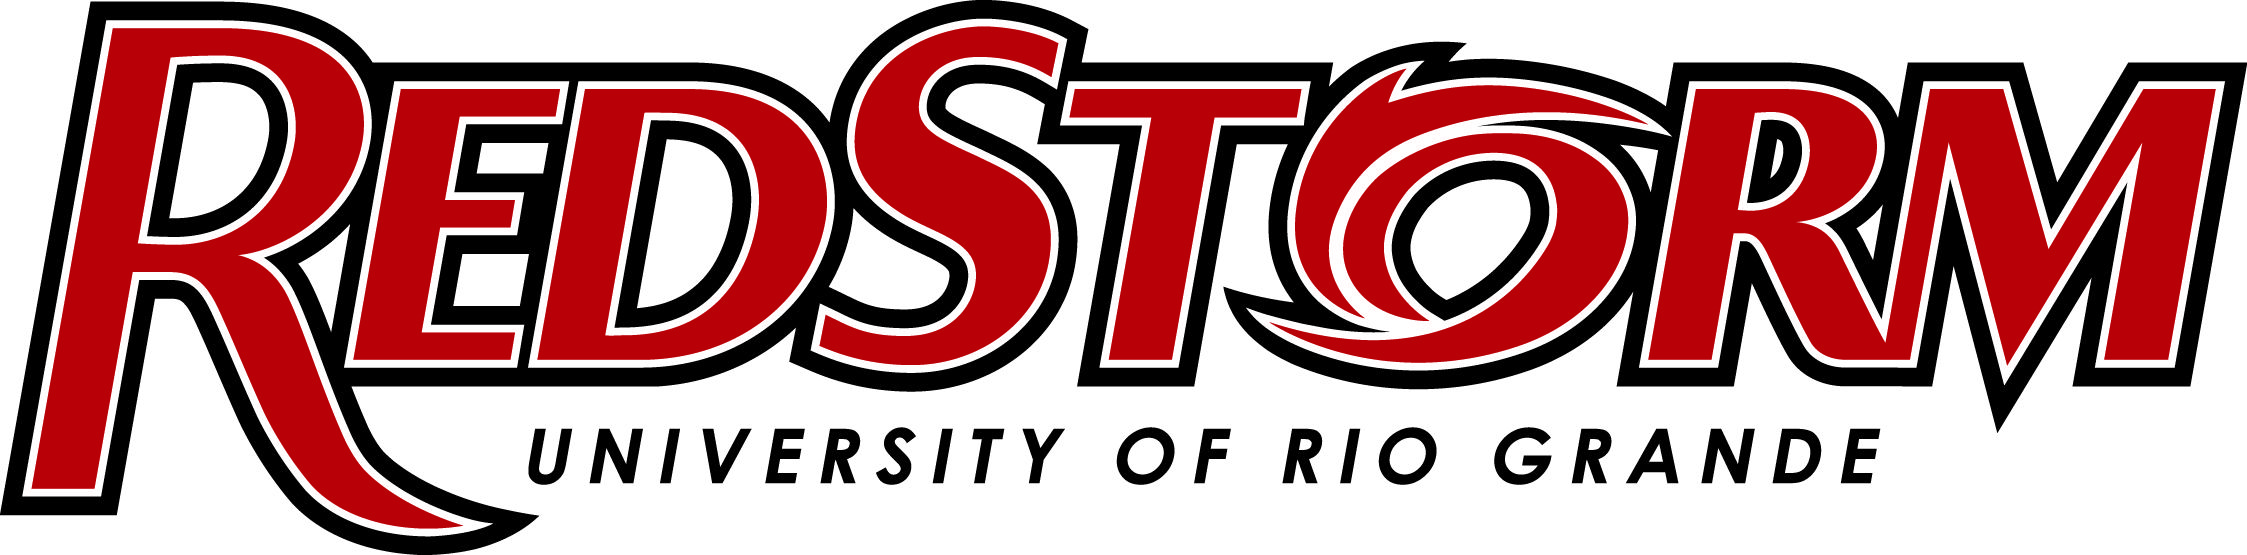 Red Storm University Of Rio Grande Rio Grande Ohio Div Ii River States Conference Redstorm Riogrande Naia L12283 Rio Grande University College Team